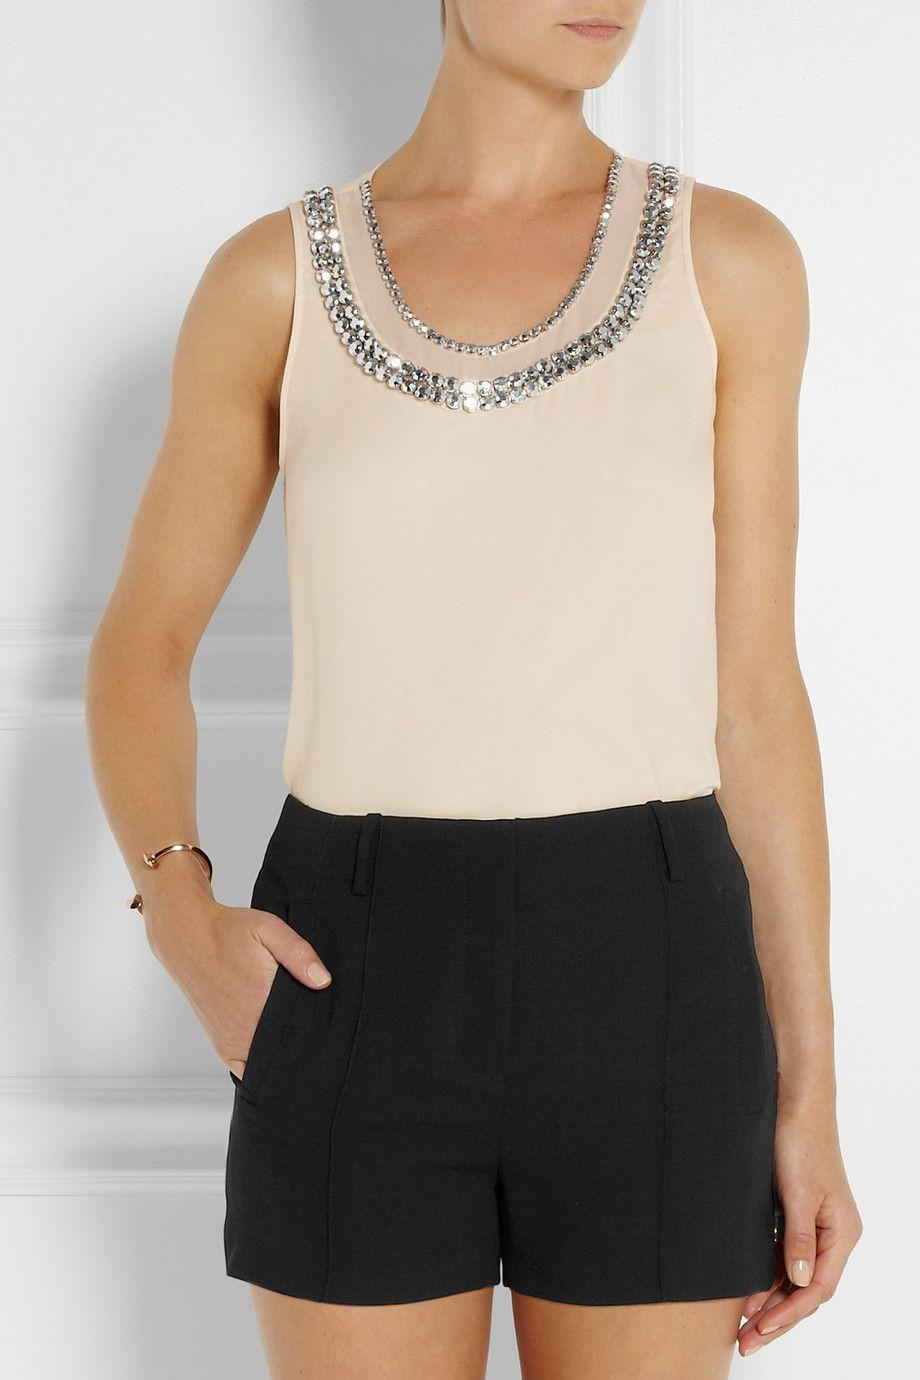 Diane von Furstenberg|Ade crystal-embellished silk-chiffon top|NET-A-PORTER.COM